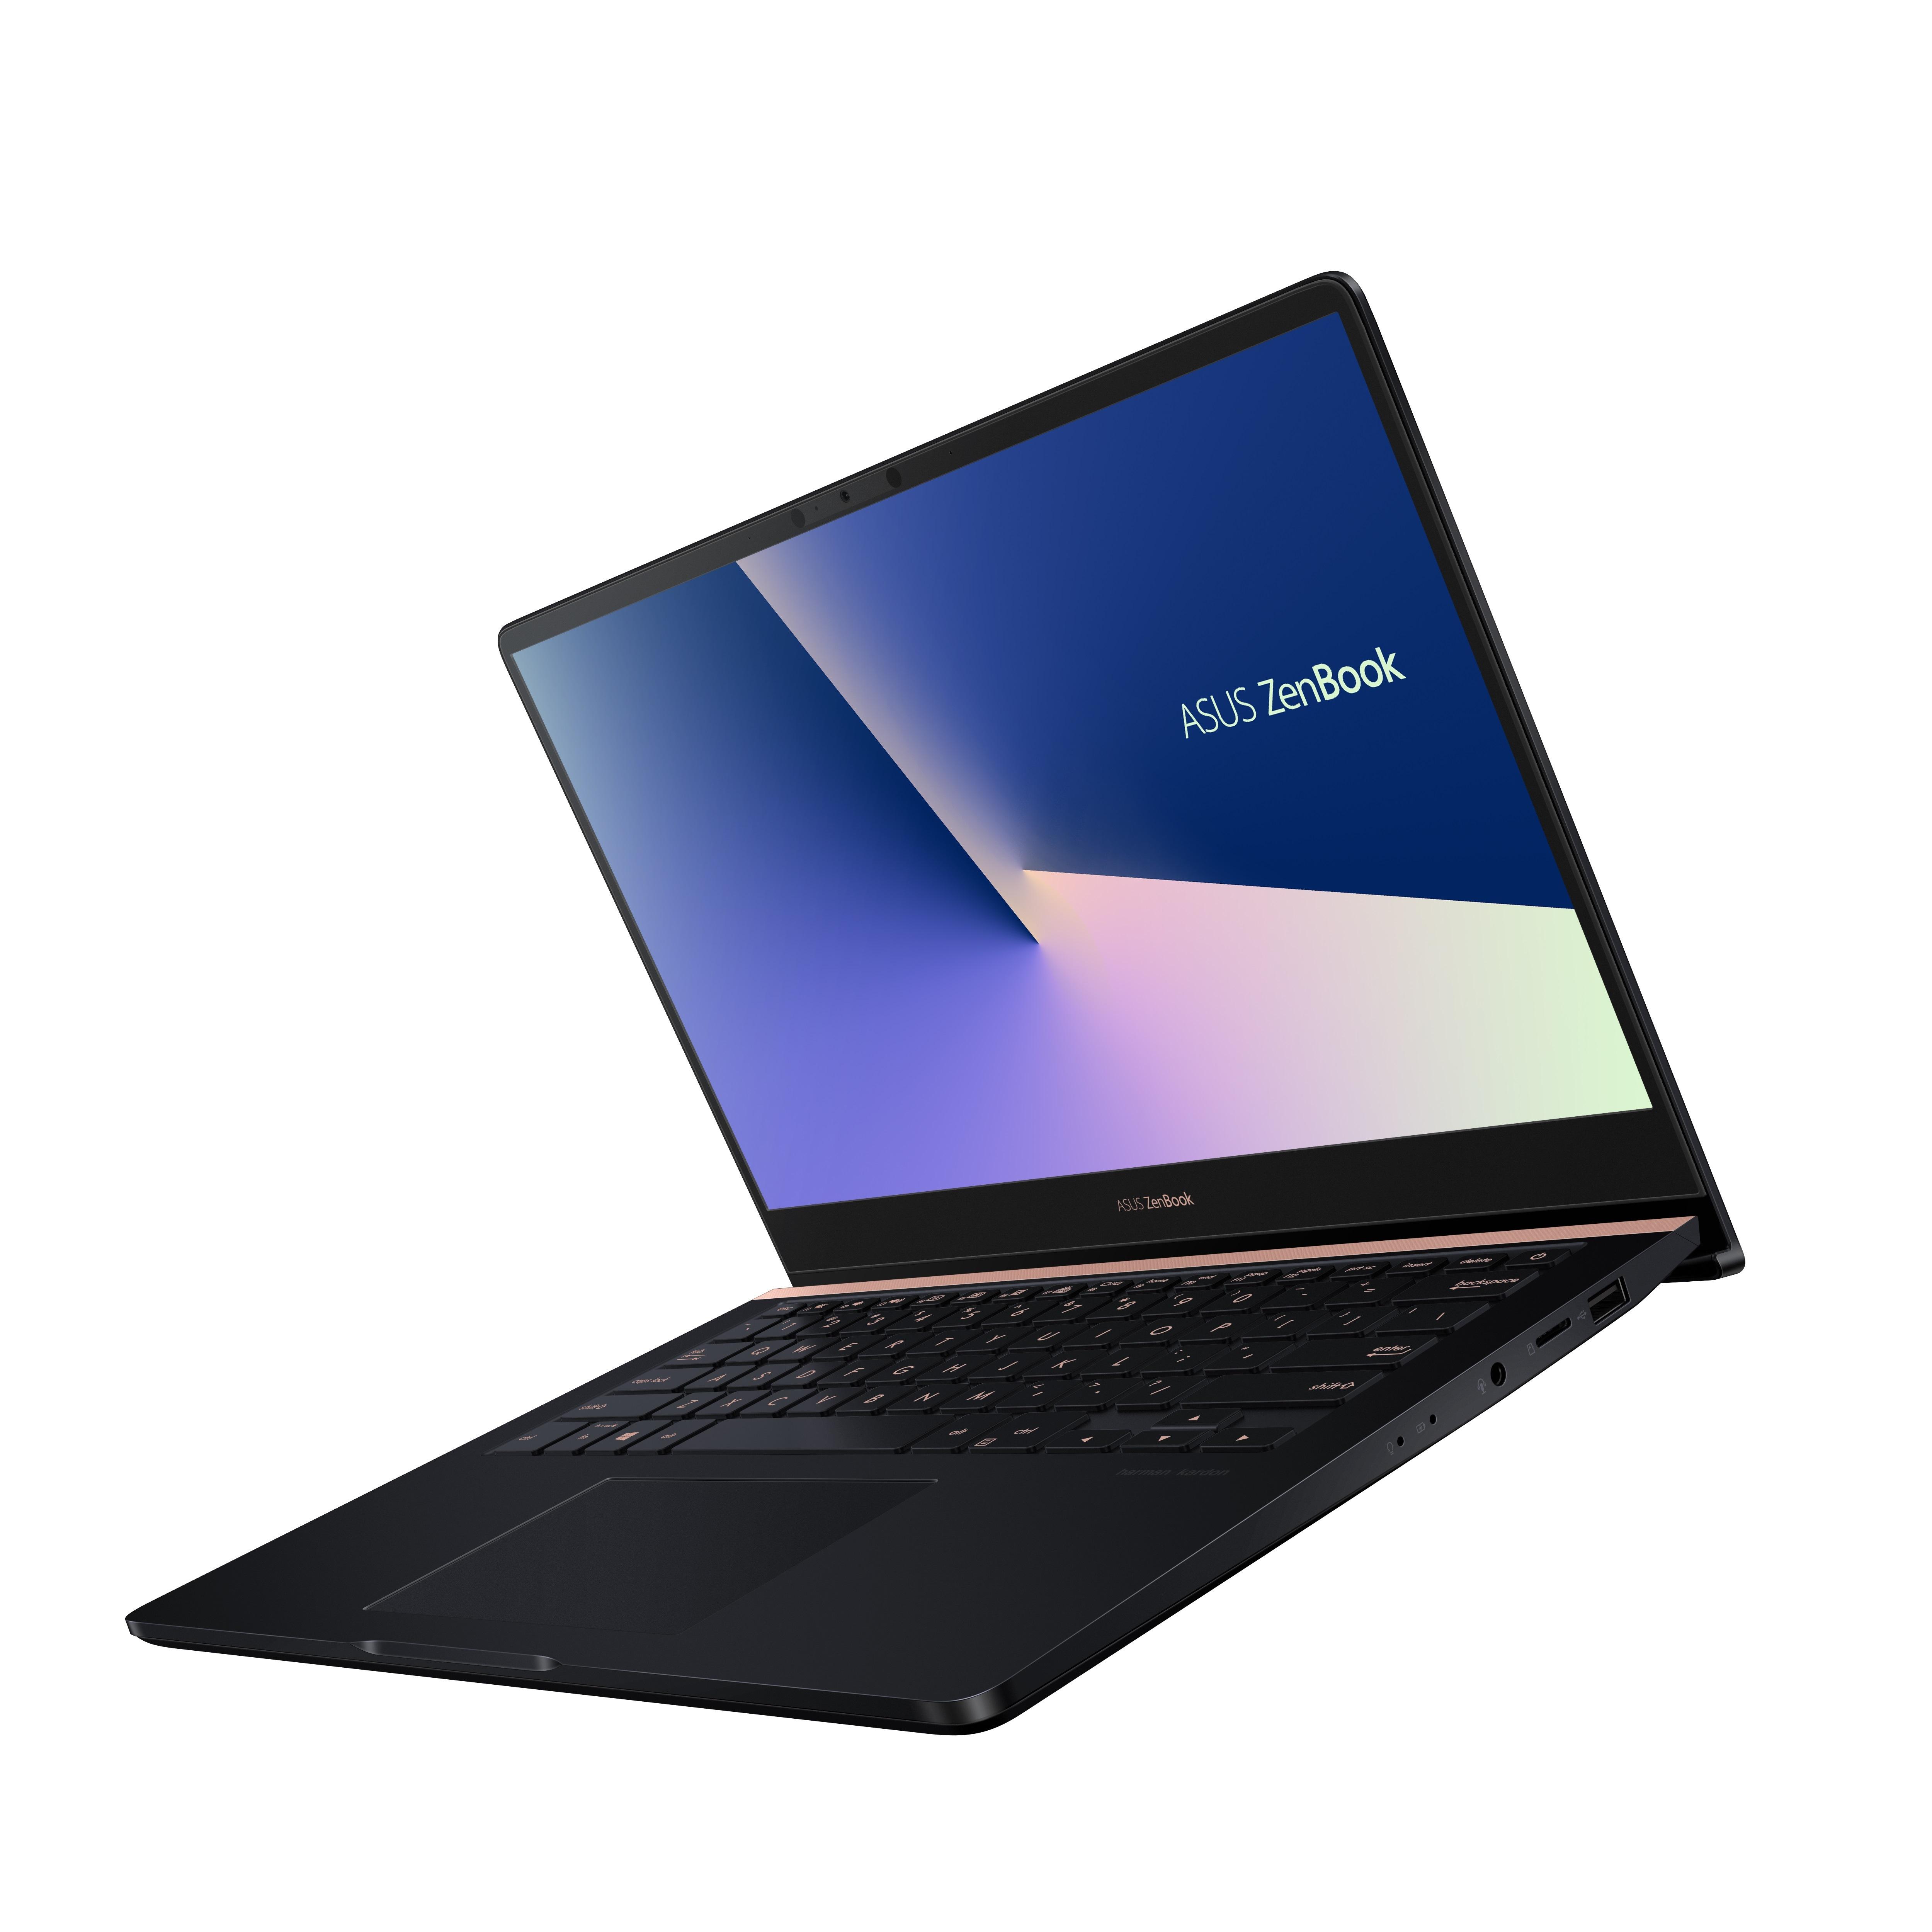 Intel-AI-on-PC-Dev-kit-2.